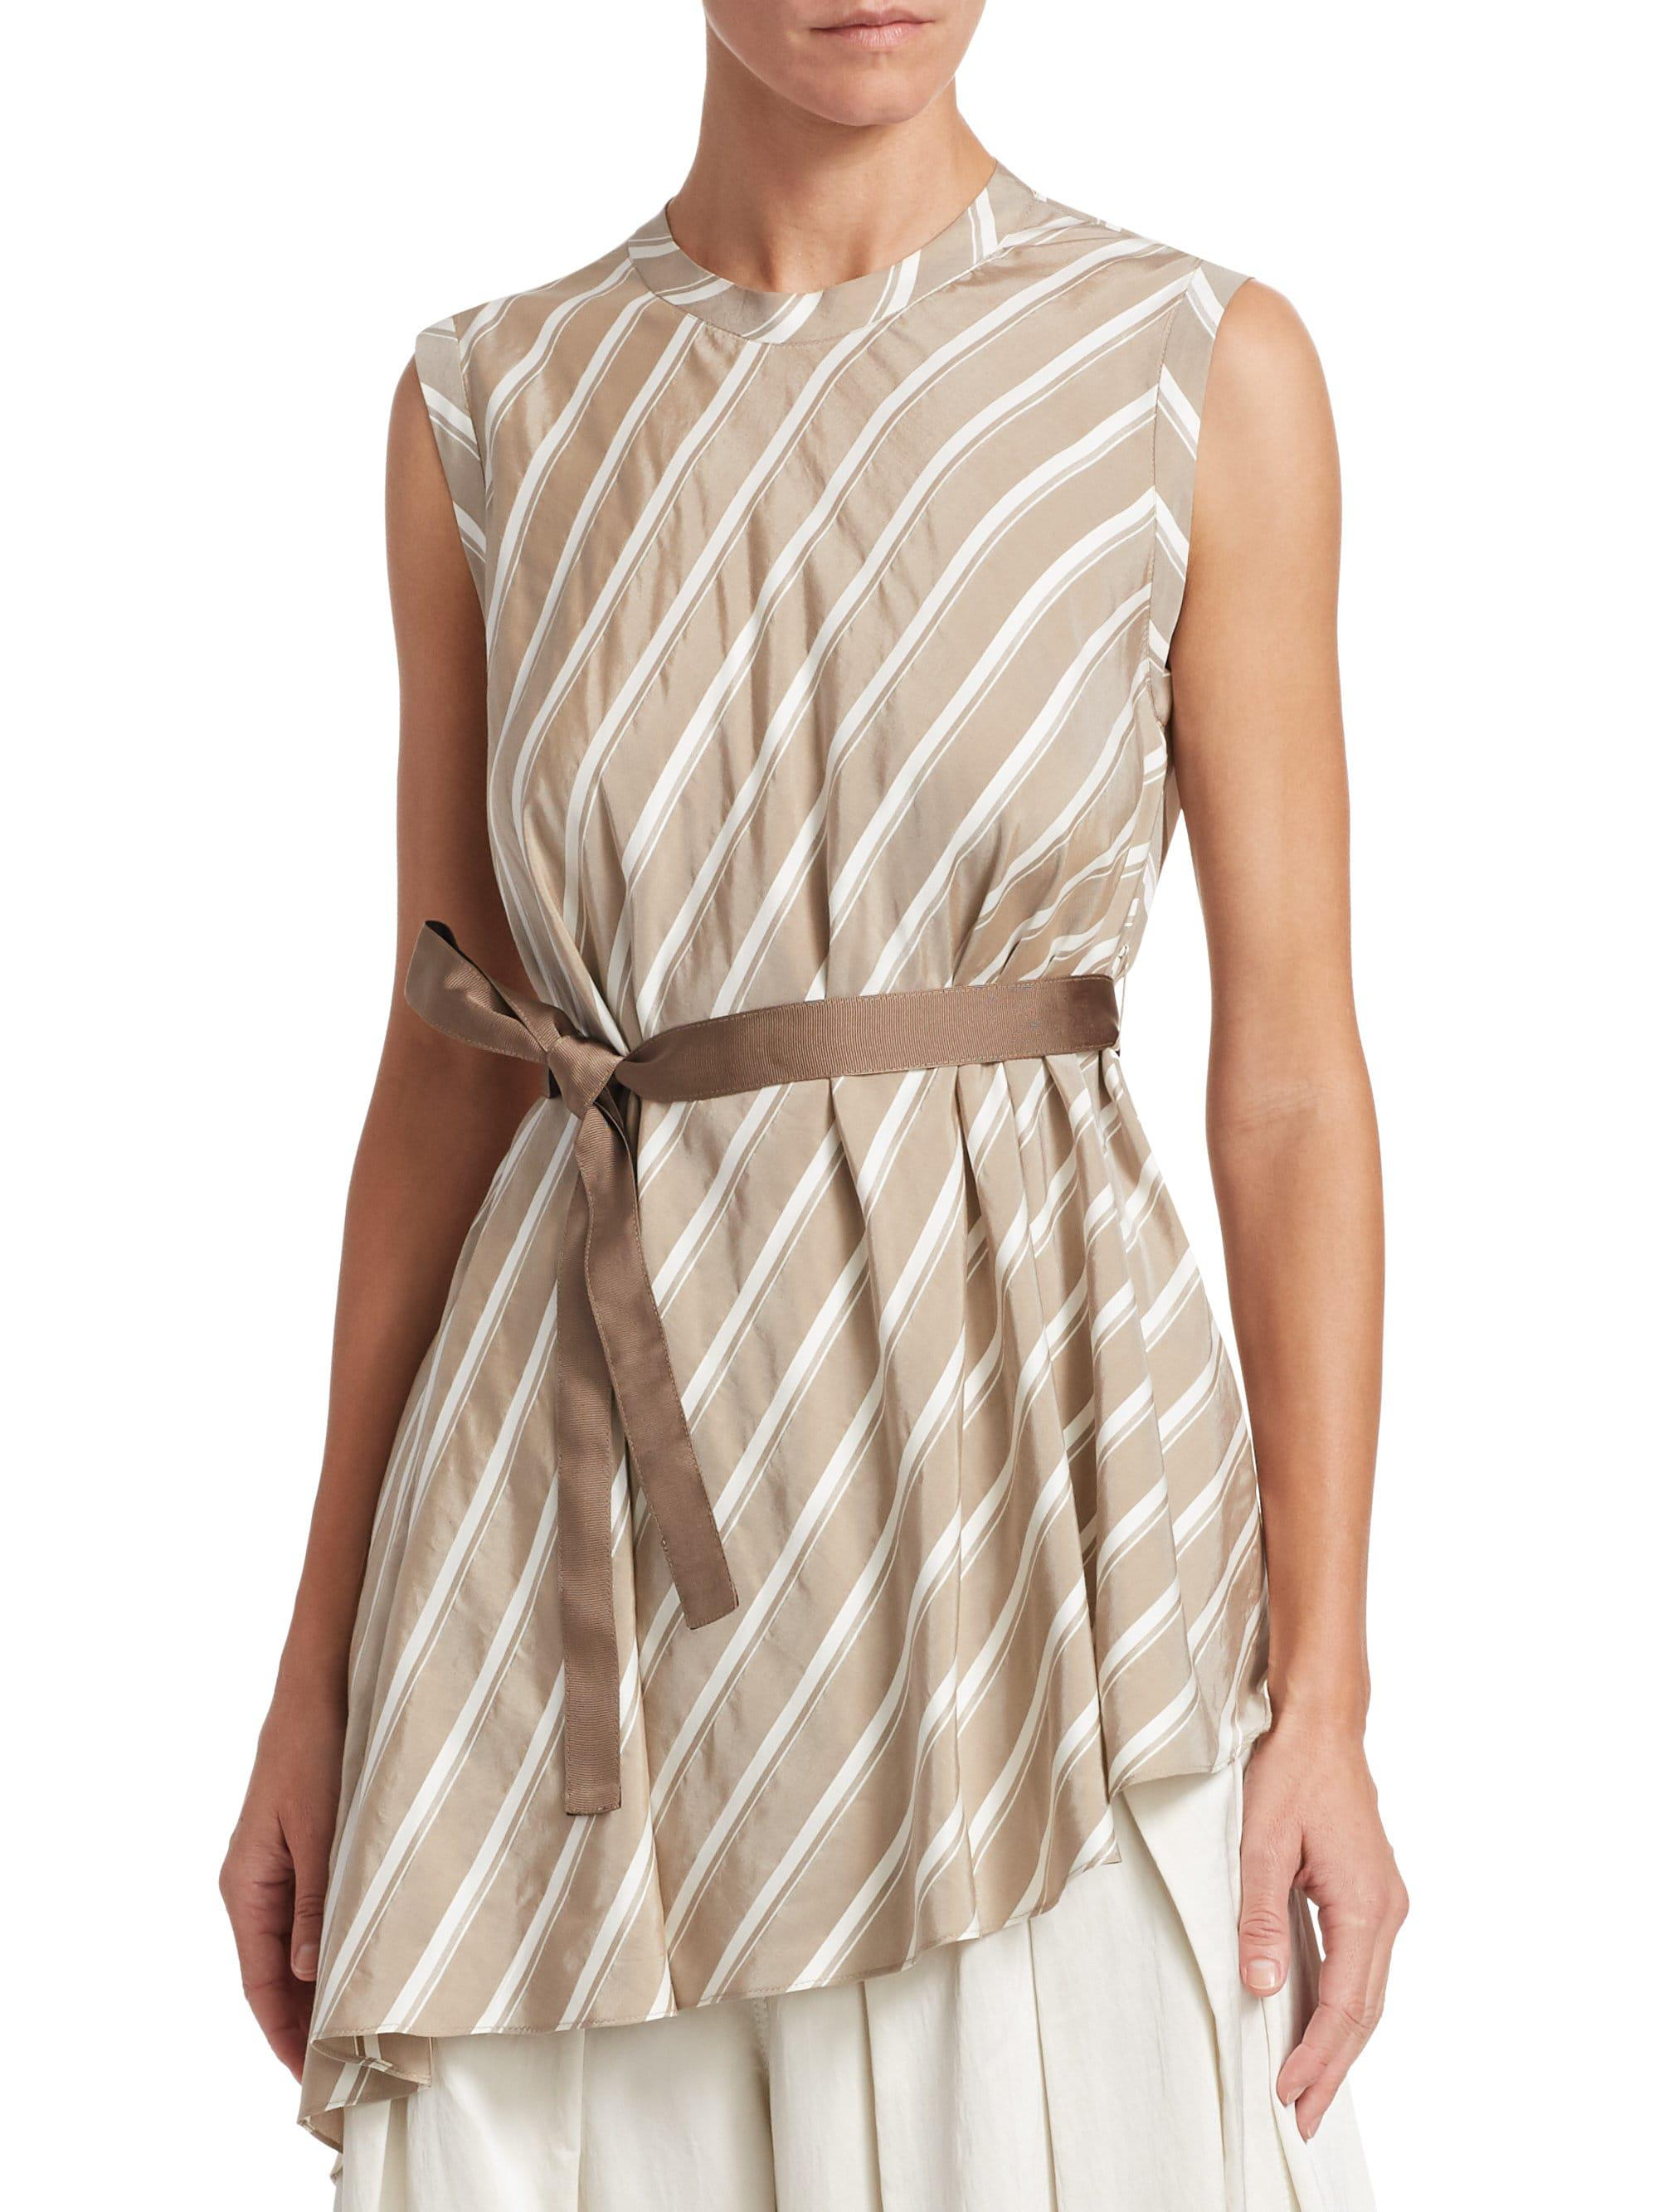 c17fc88f30296 Lyst - Brunello Cucinelli Striped Asymmetric Silk Top in White